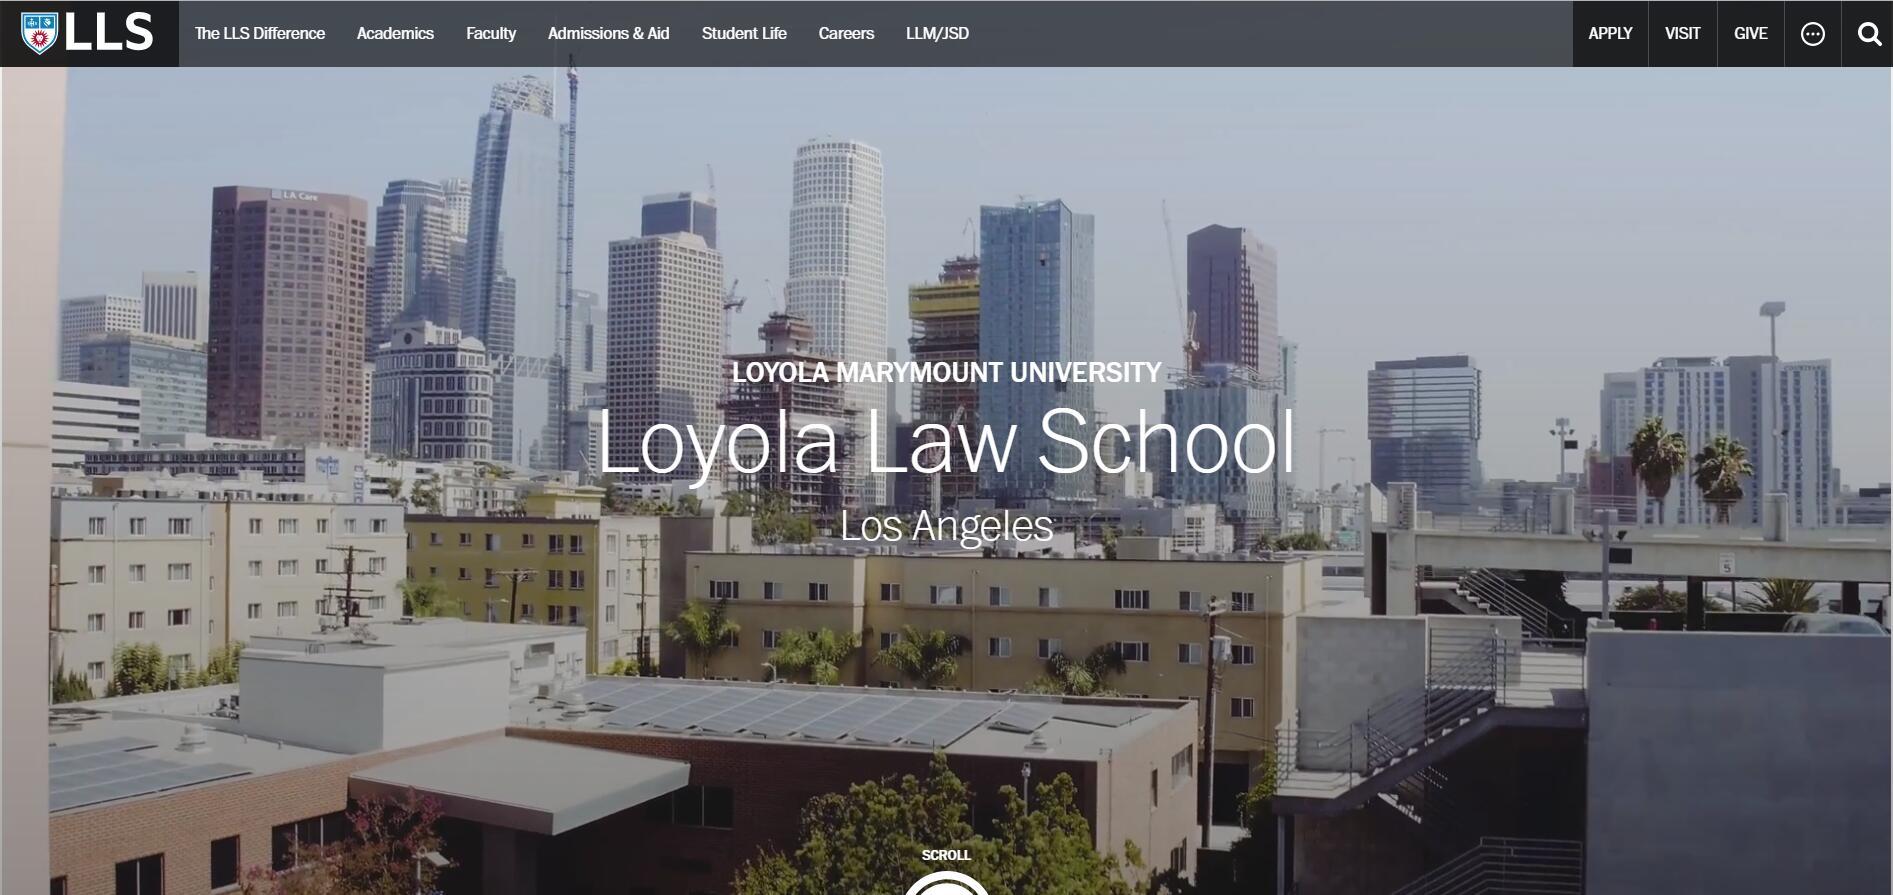 The Loyola Law School Los Angeles at Loyola Marymount University